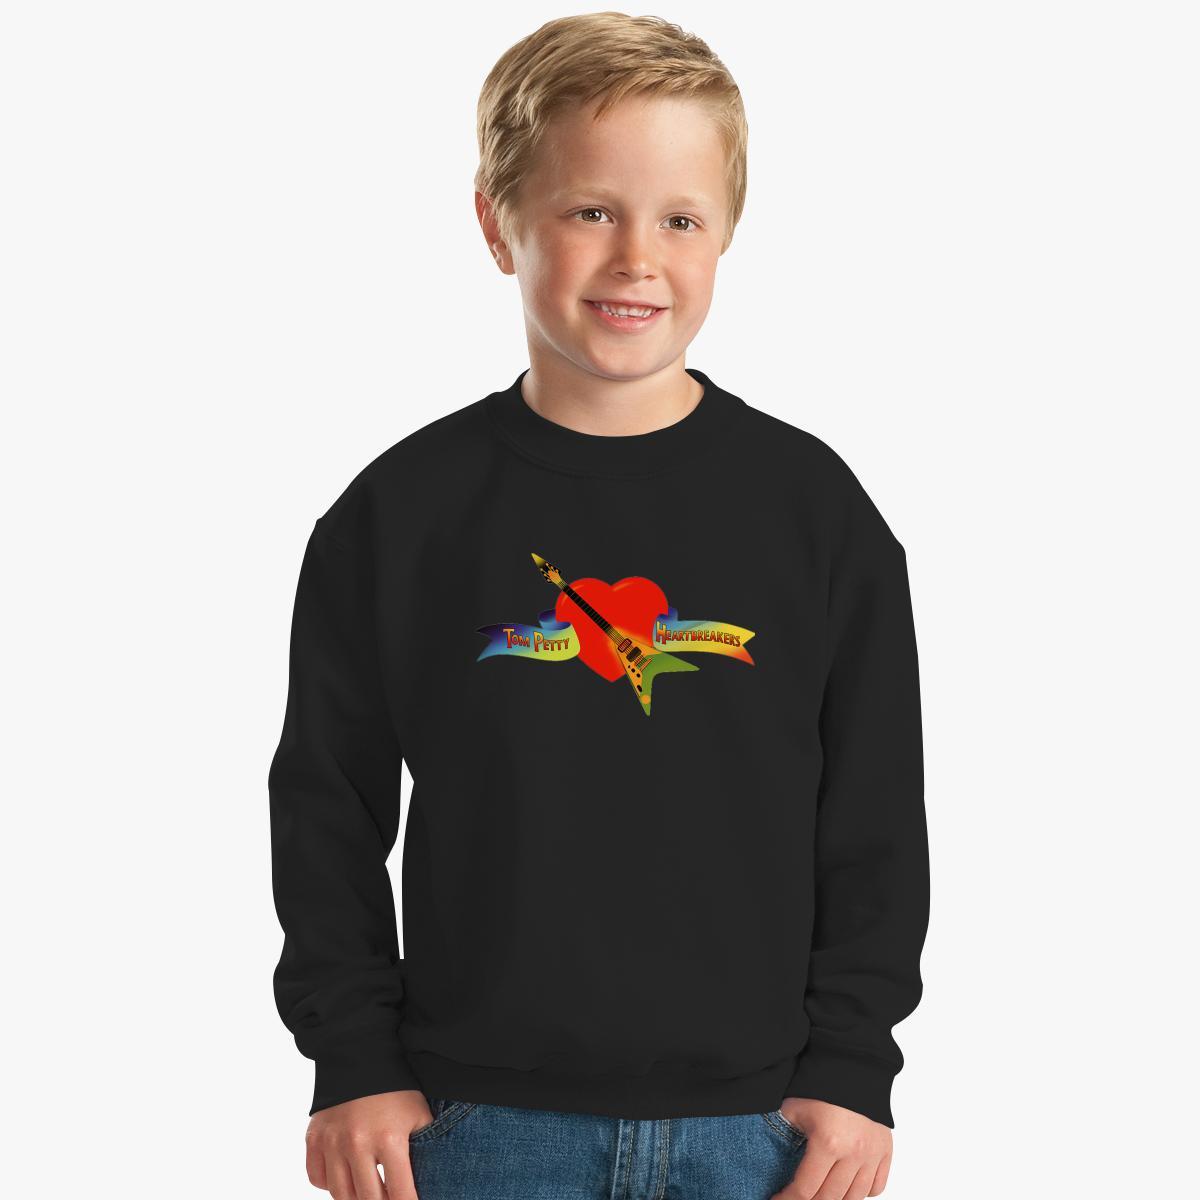 Tom Petty And The Heartbreakers Kids Sweatshirt